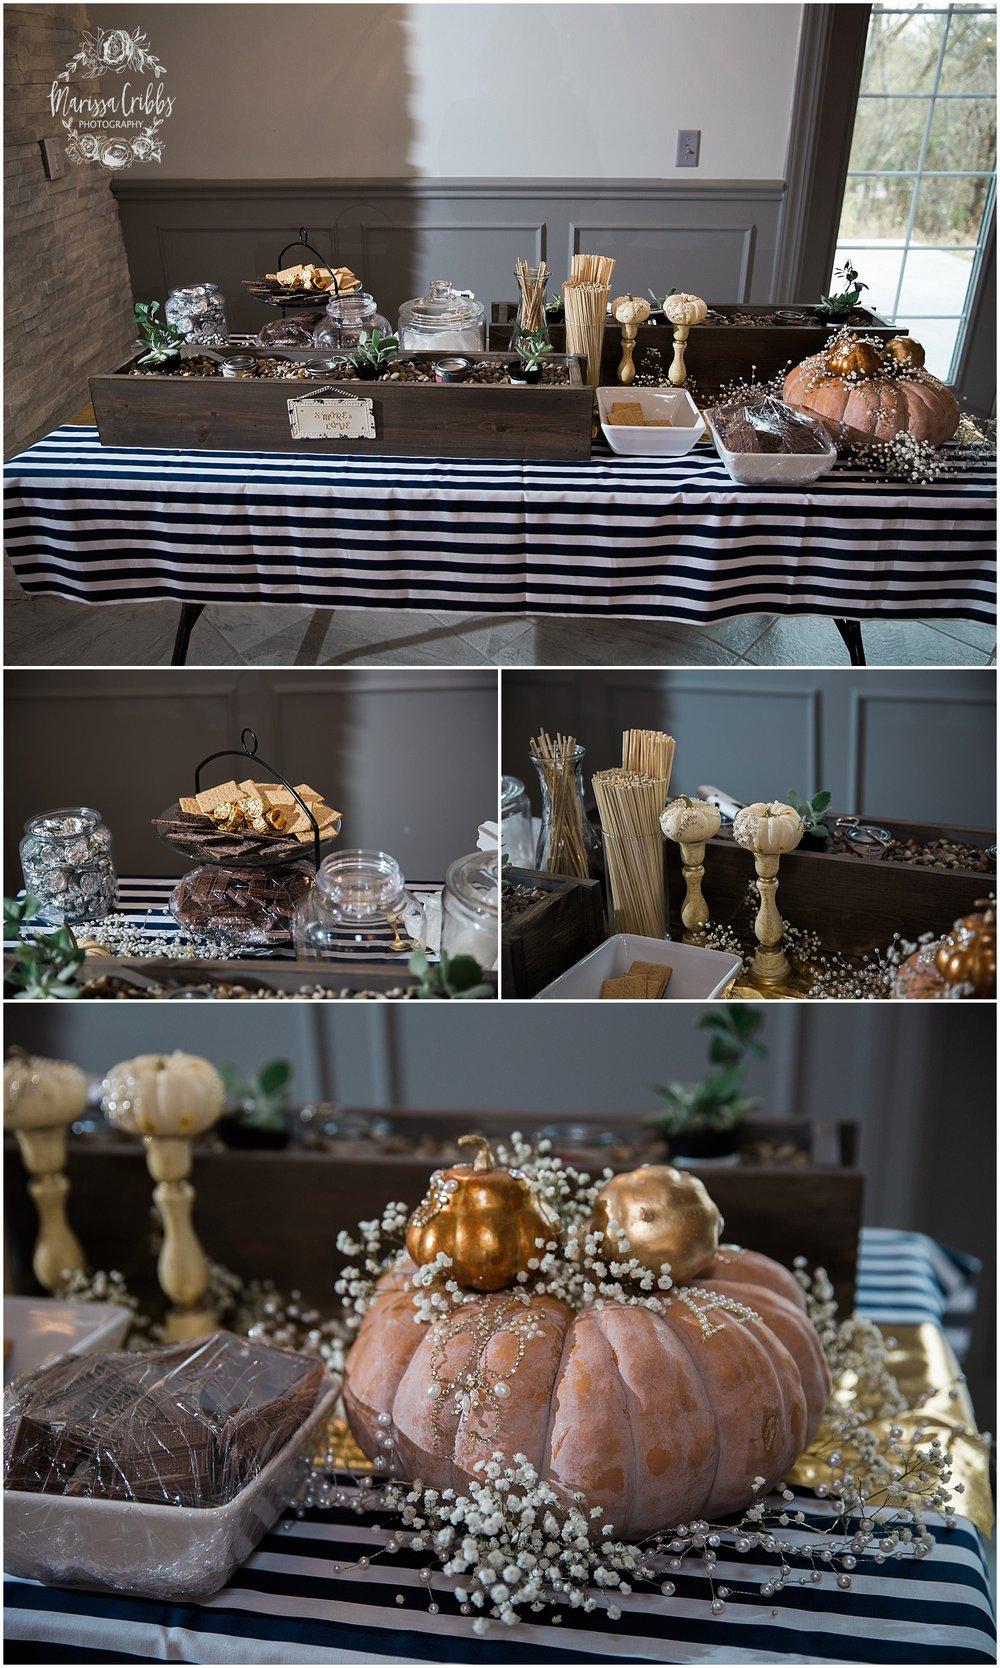 Alex+&+Amie+_+Eighteen+Ninety+Event+Space+_+Marissa+Cribbs+Photography+_+Kansas+City+Perfect+Wedding+Guide_1380.jpg